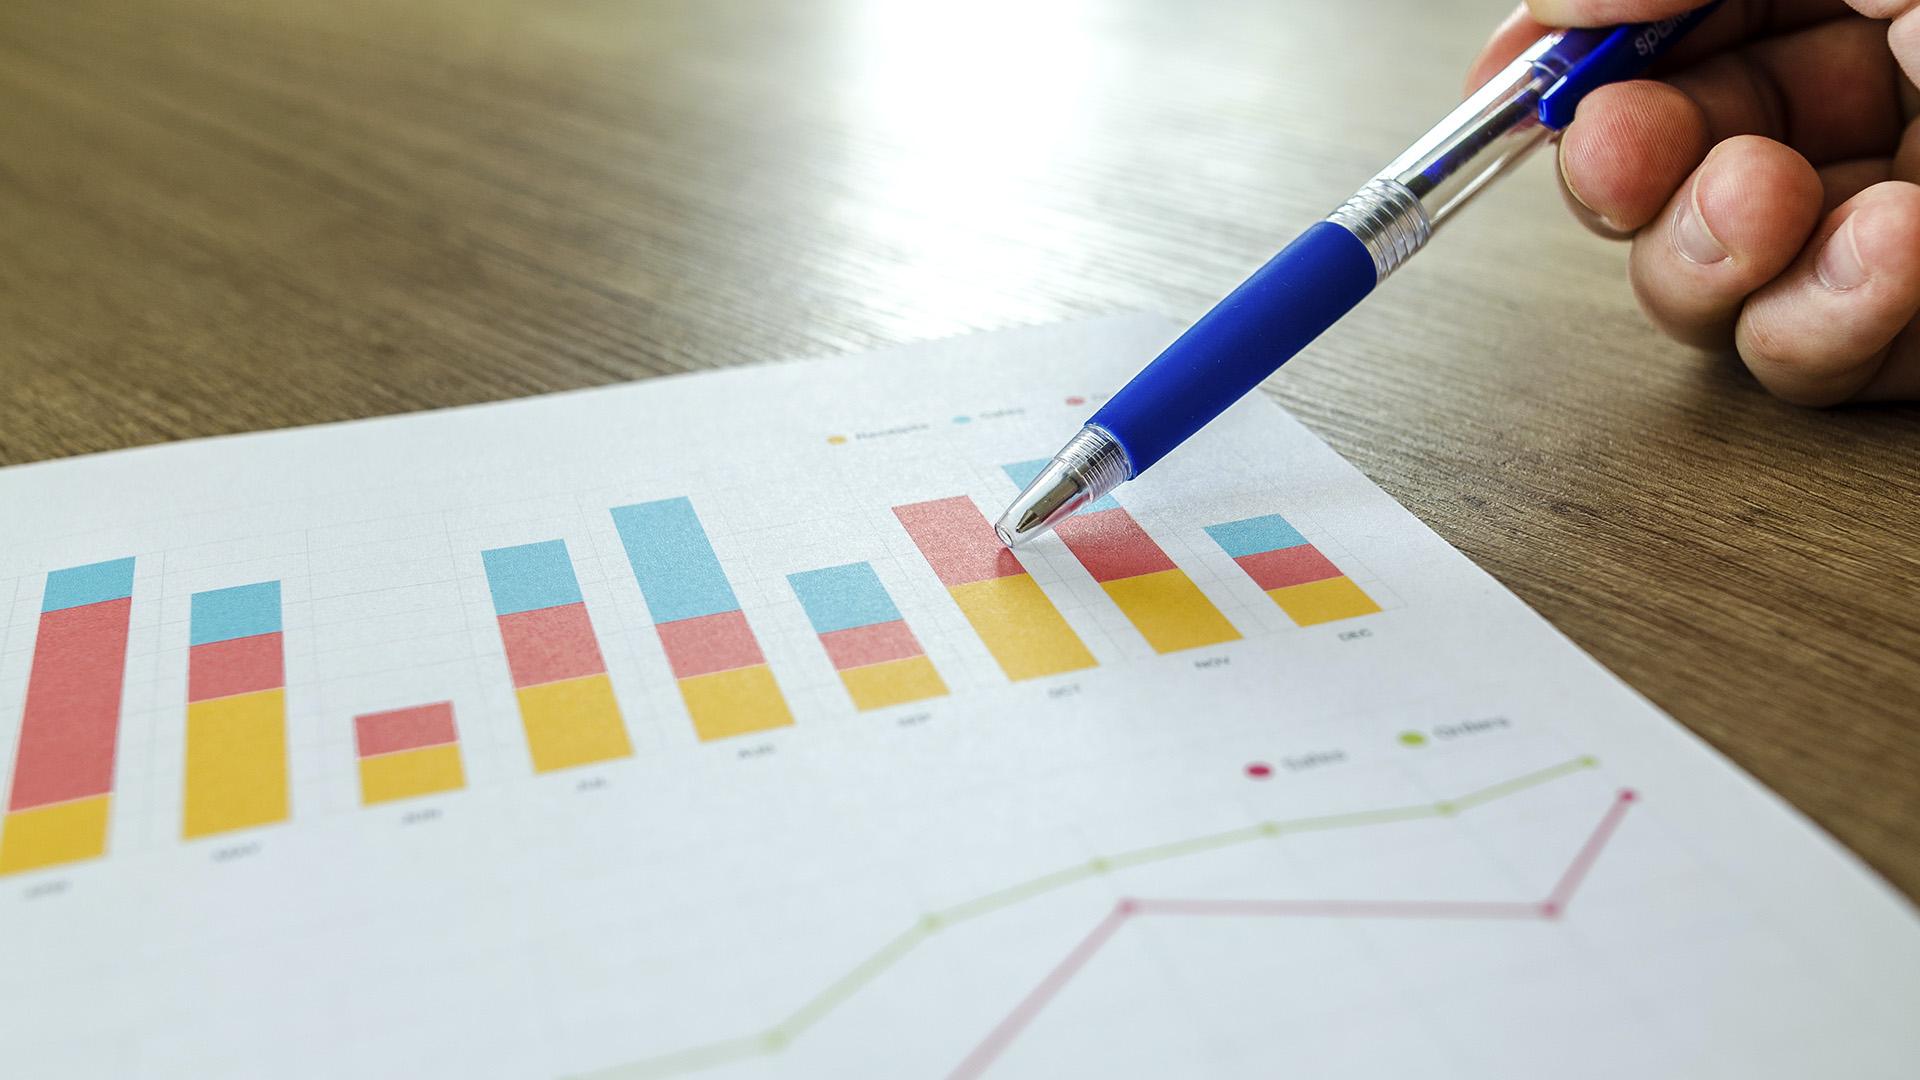 Infosys Q1 Net Profit Jumps 22.7 Percent, Clocks Fastest Revenue Growth In A Decade